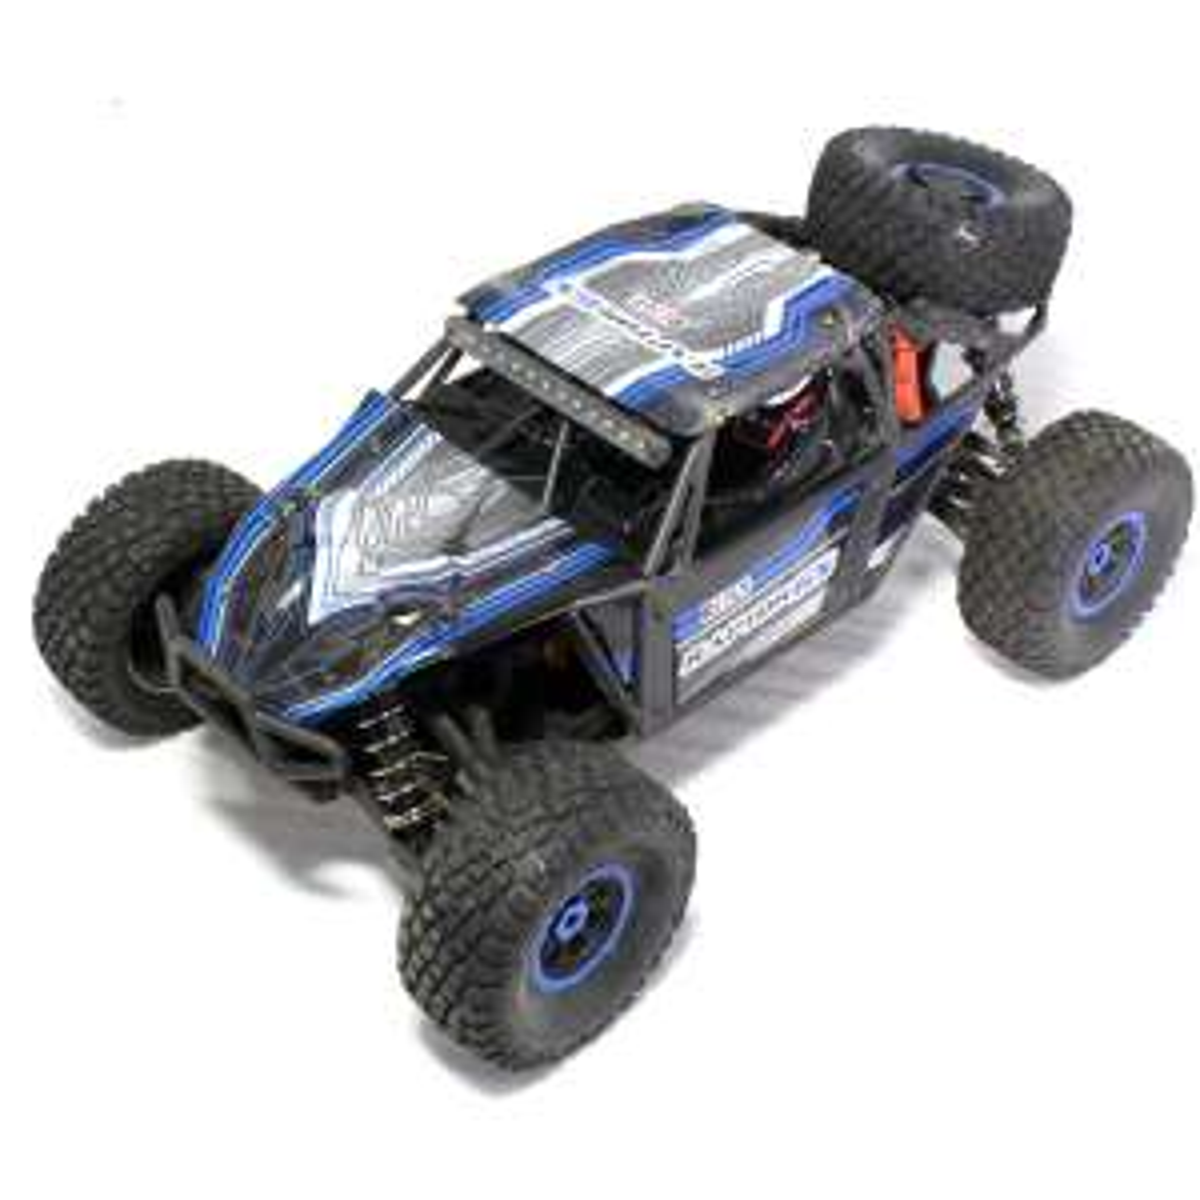 Reely Raptor - 6S Brushless 1:8 RC Modellauto Elektro Buggy Allradantrieb (4WD) RtR 2,4GHz inkl. Fernsteueranlage